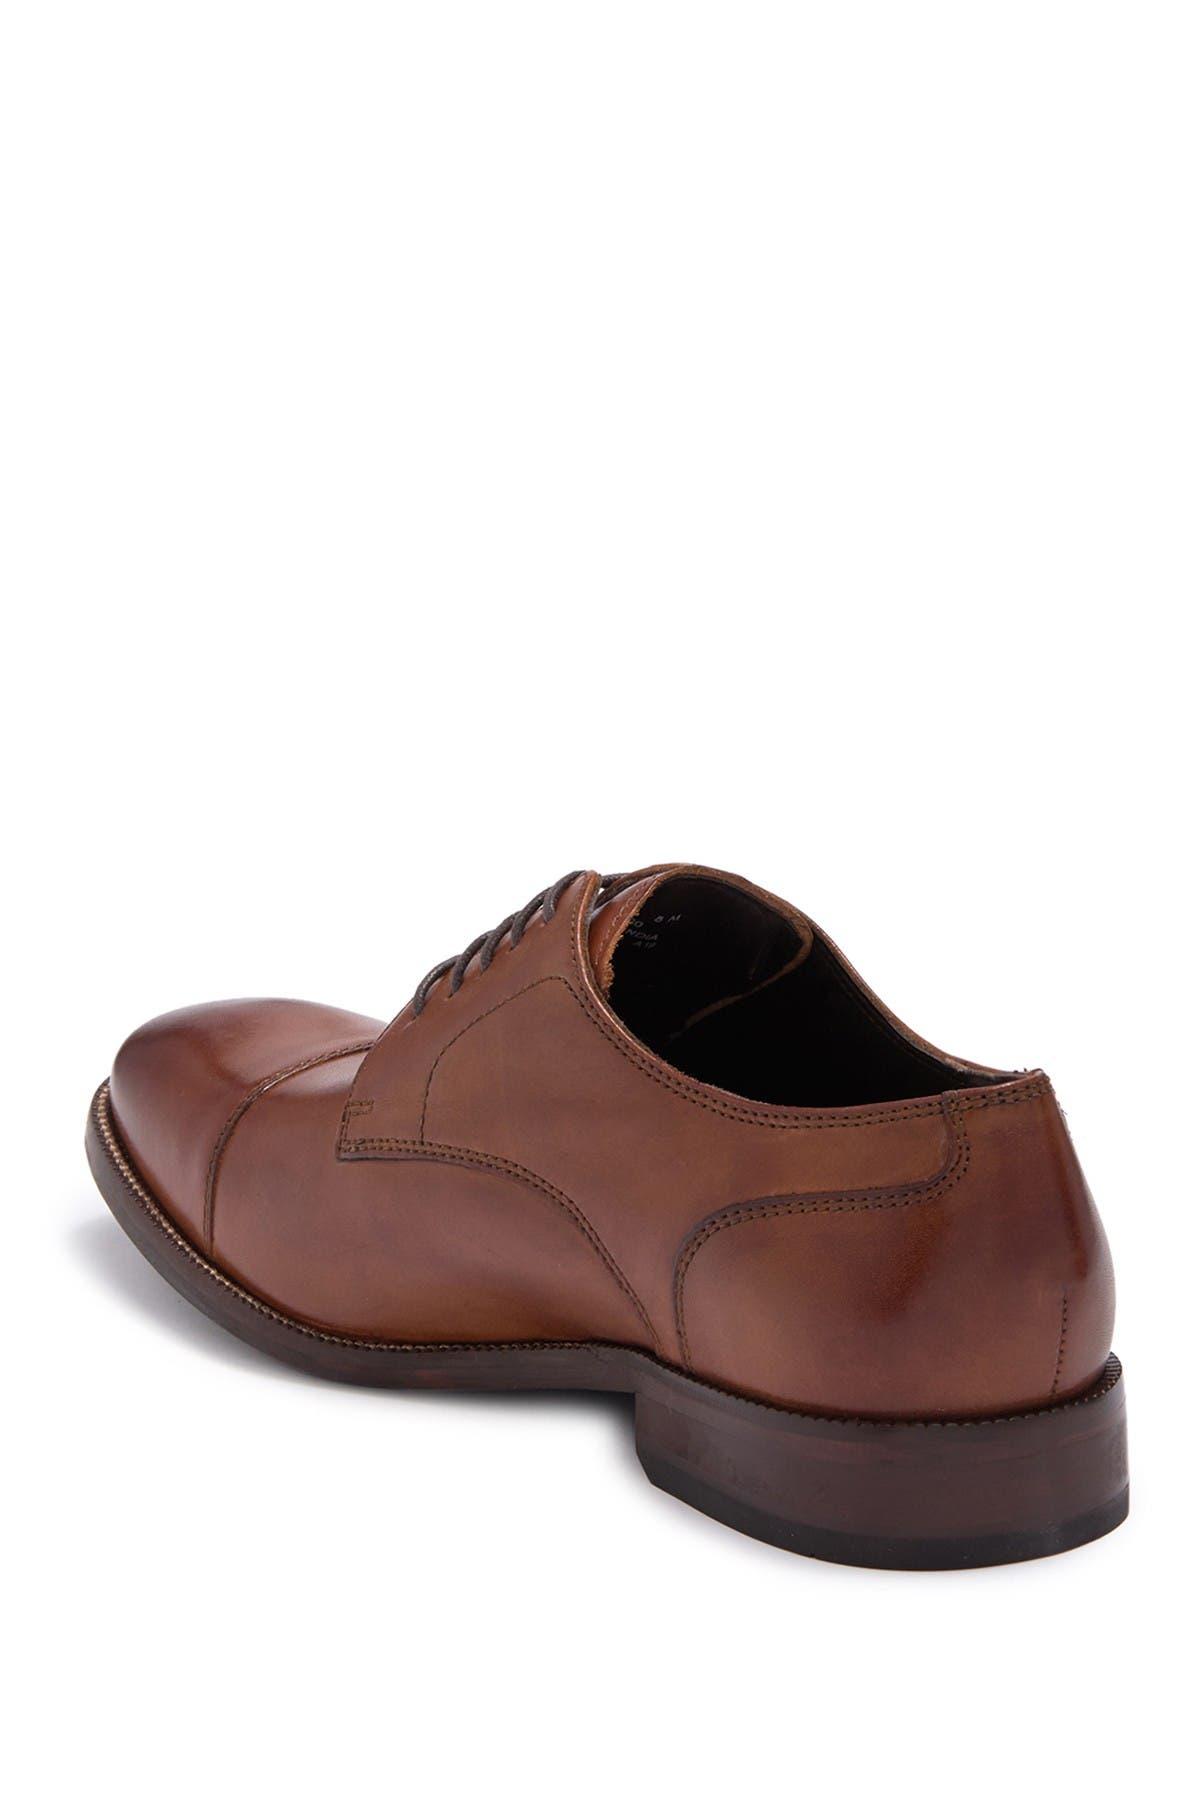 Cole Haan Benton Leather Cap Toe Derby II - Wide Width Available